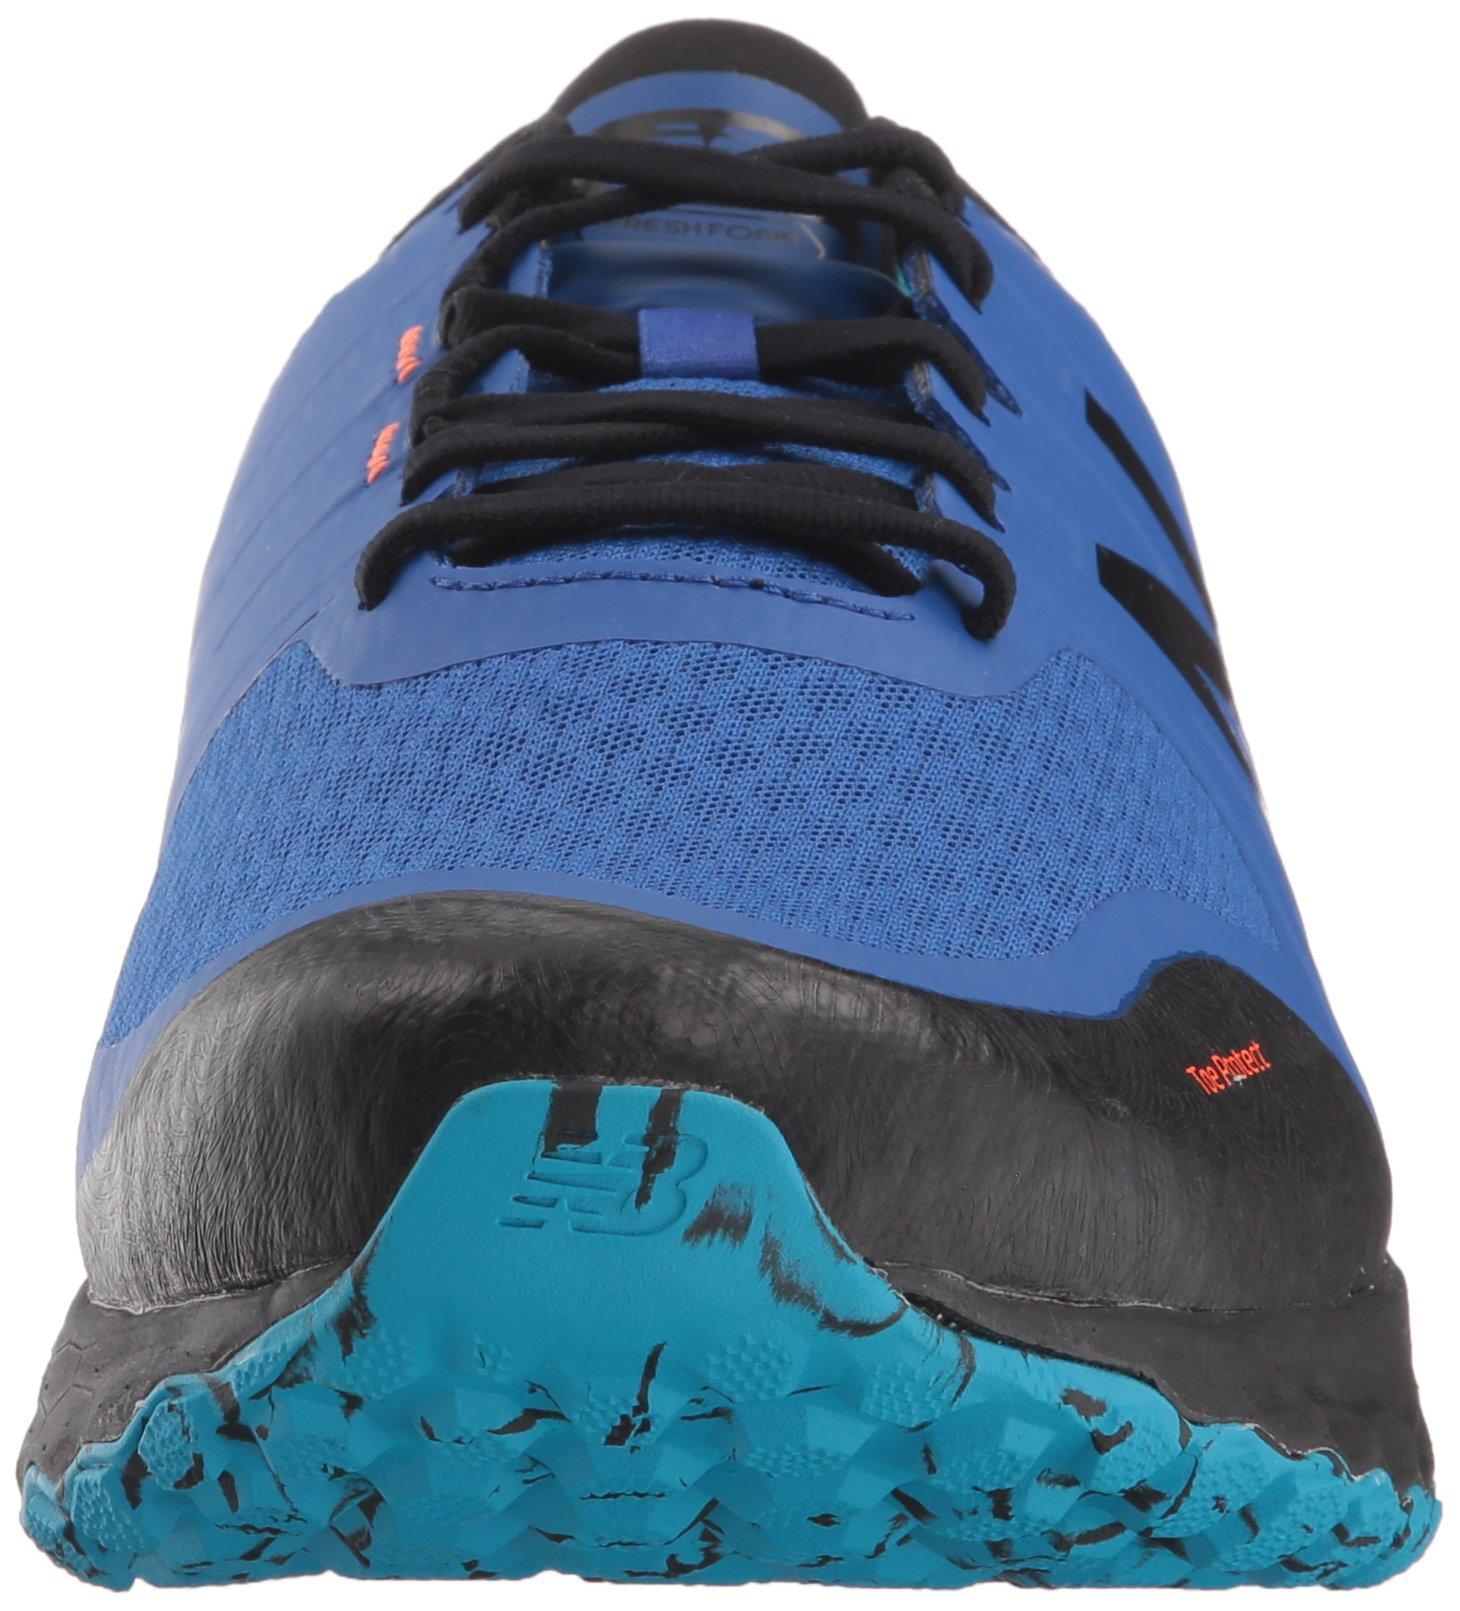 New Balance Men's Kaymin Trail v1 Fresh Foam Trail Running Shoe, Deep Pacific, 7 D US by New Balance (Image #4)